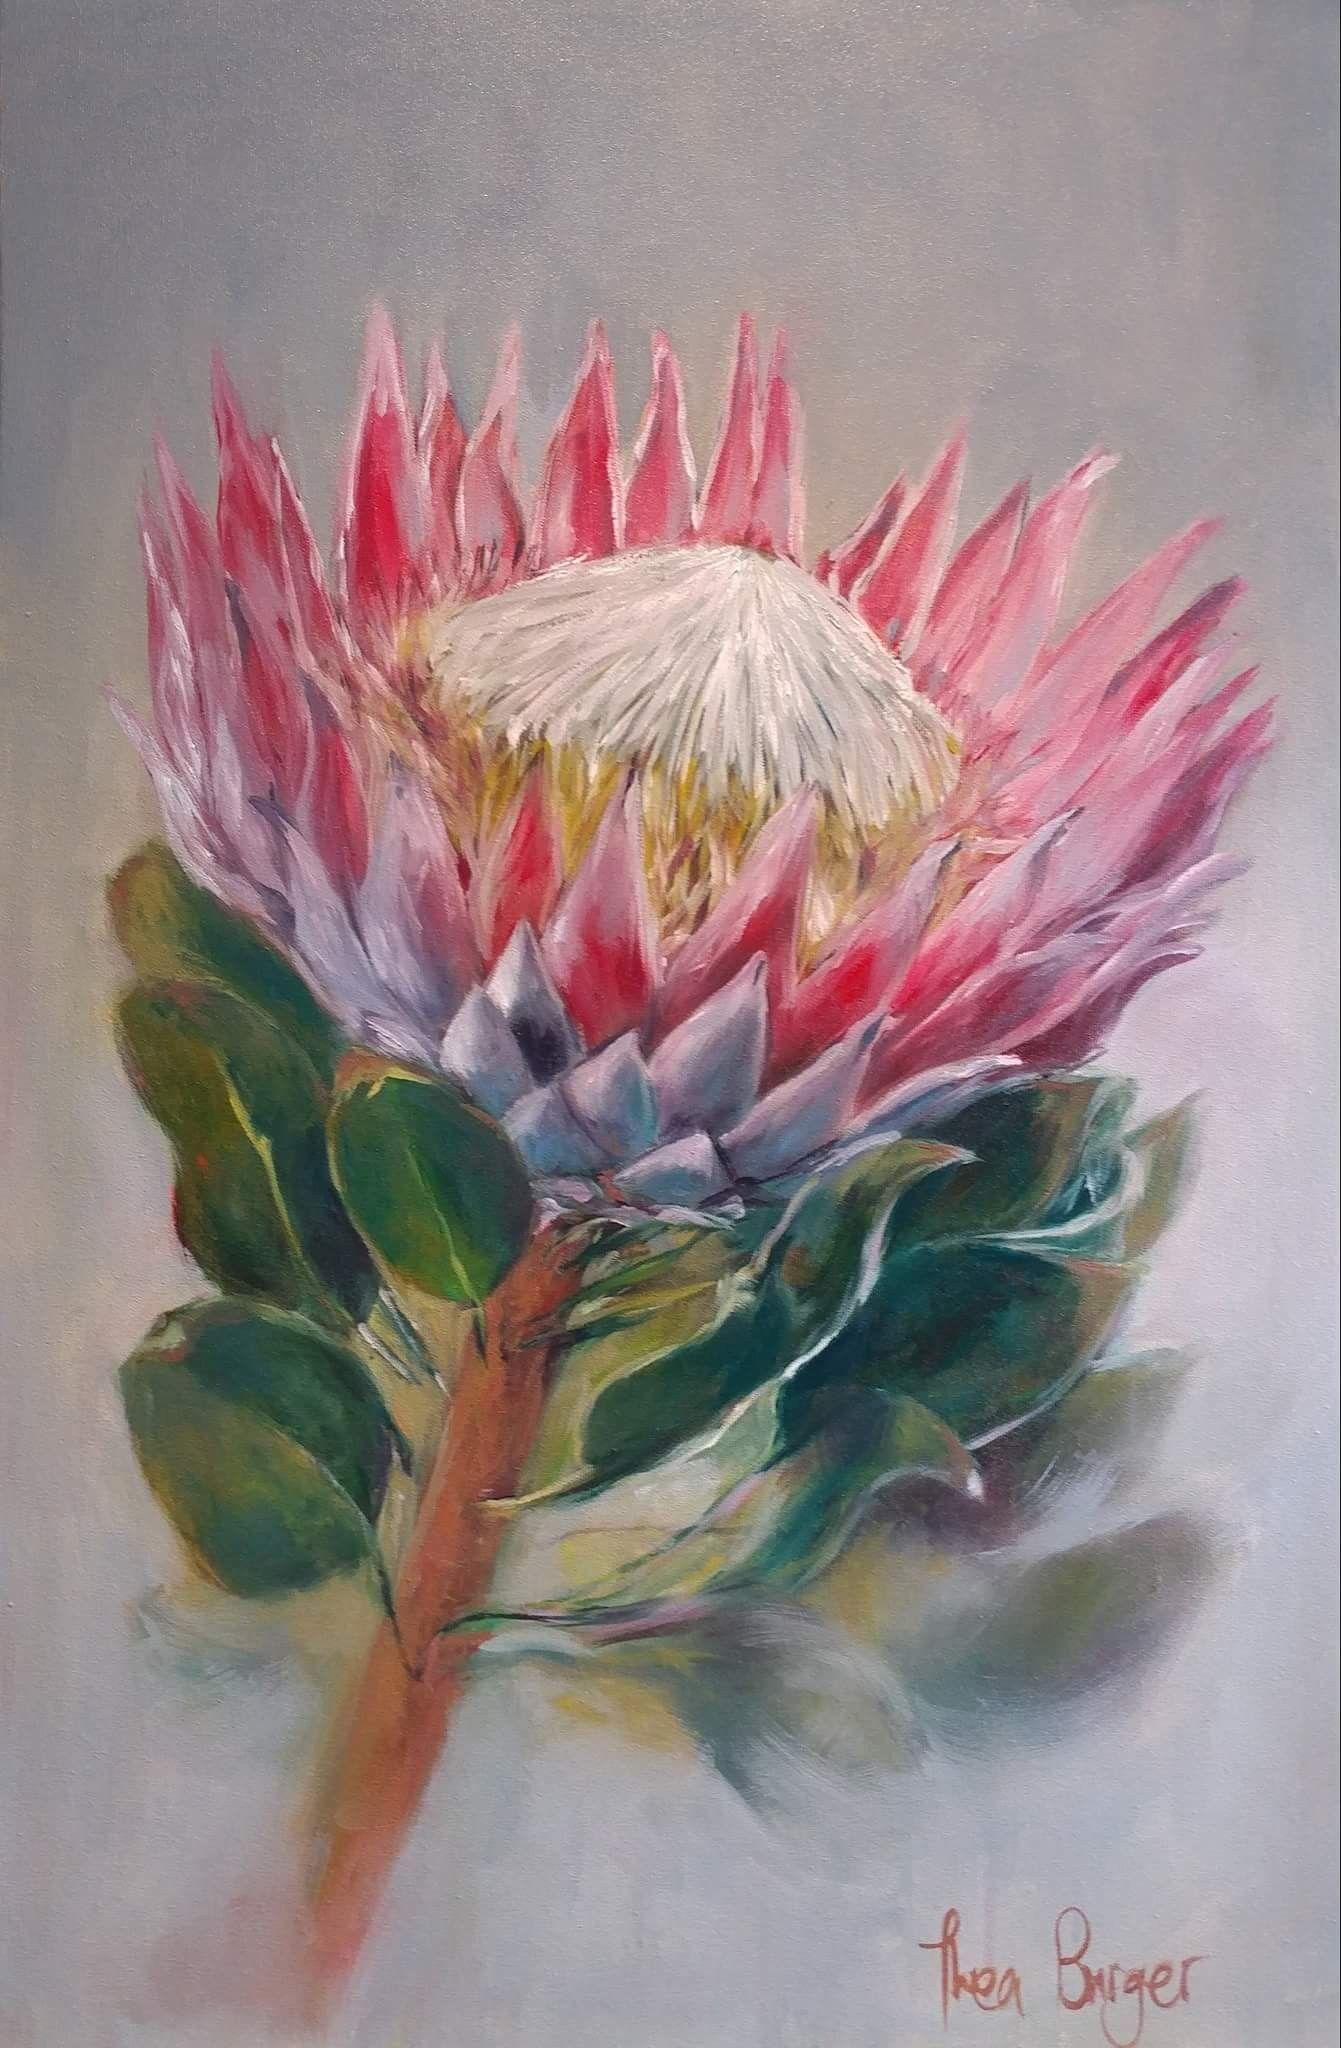 King Protea Watercolor Painting Print By Slaveika Aladjova Art Illustration Home Decor Contemporary Australian Native Plant Botanical In 2020 Protea Art Flower Art Botanical Drawings